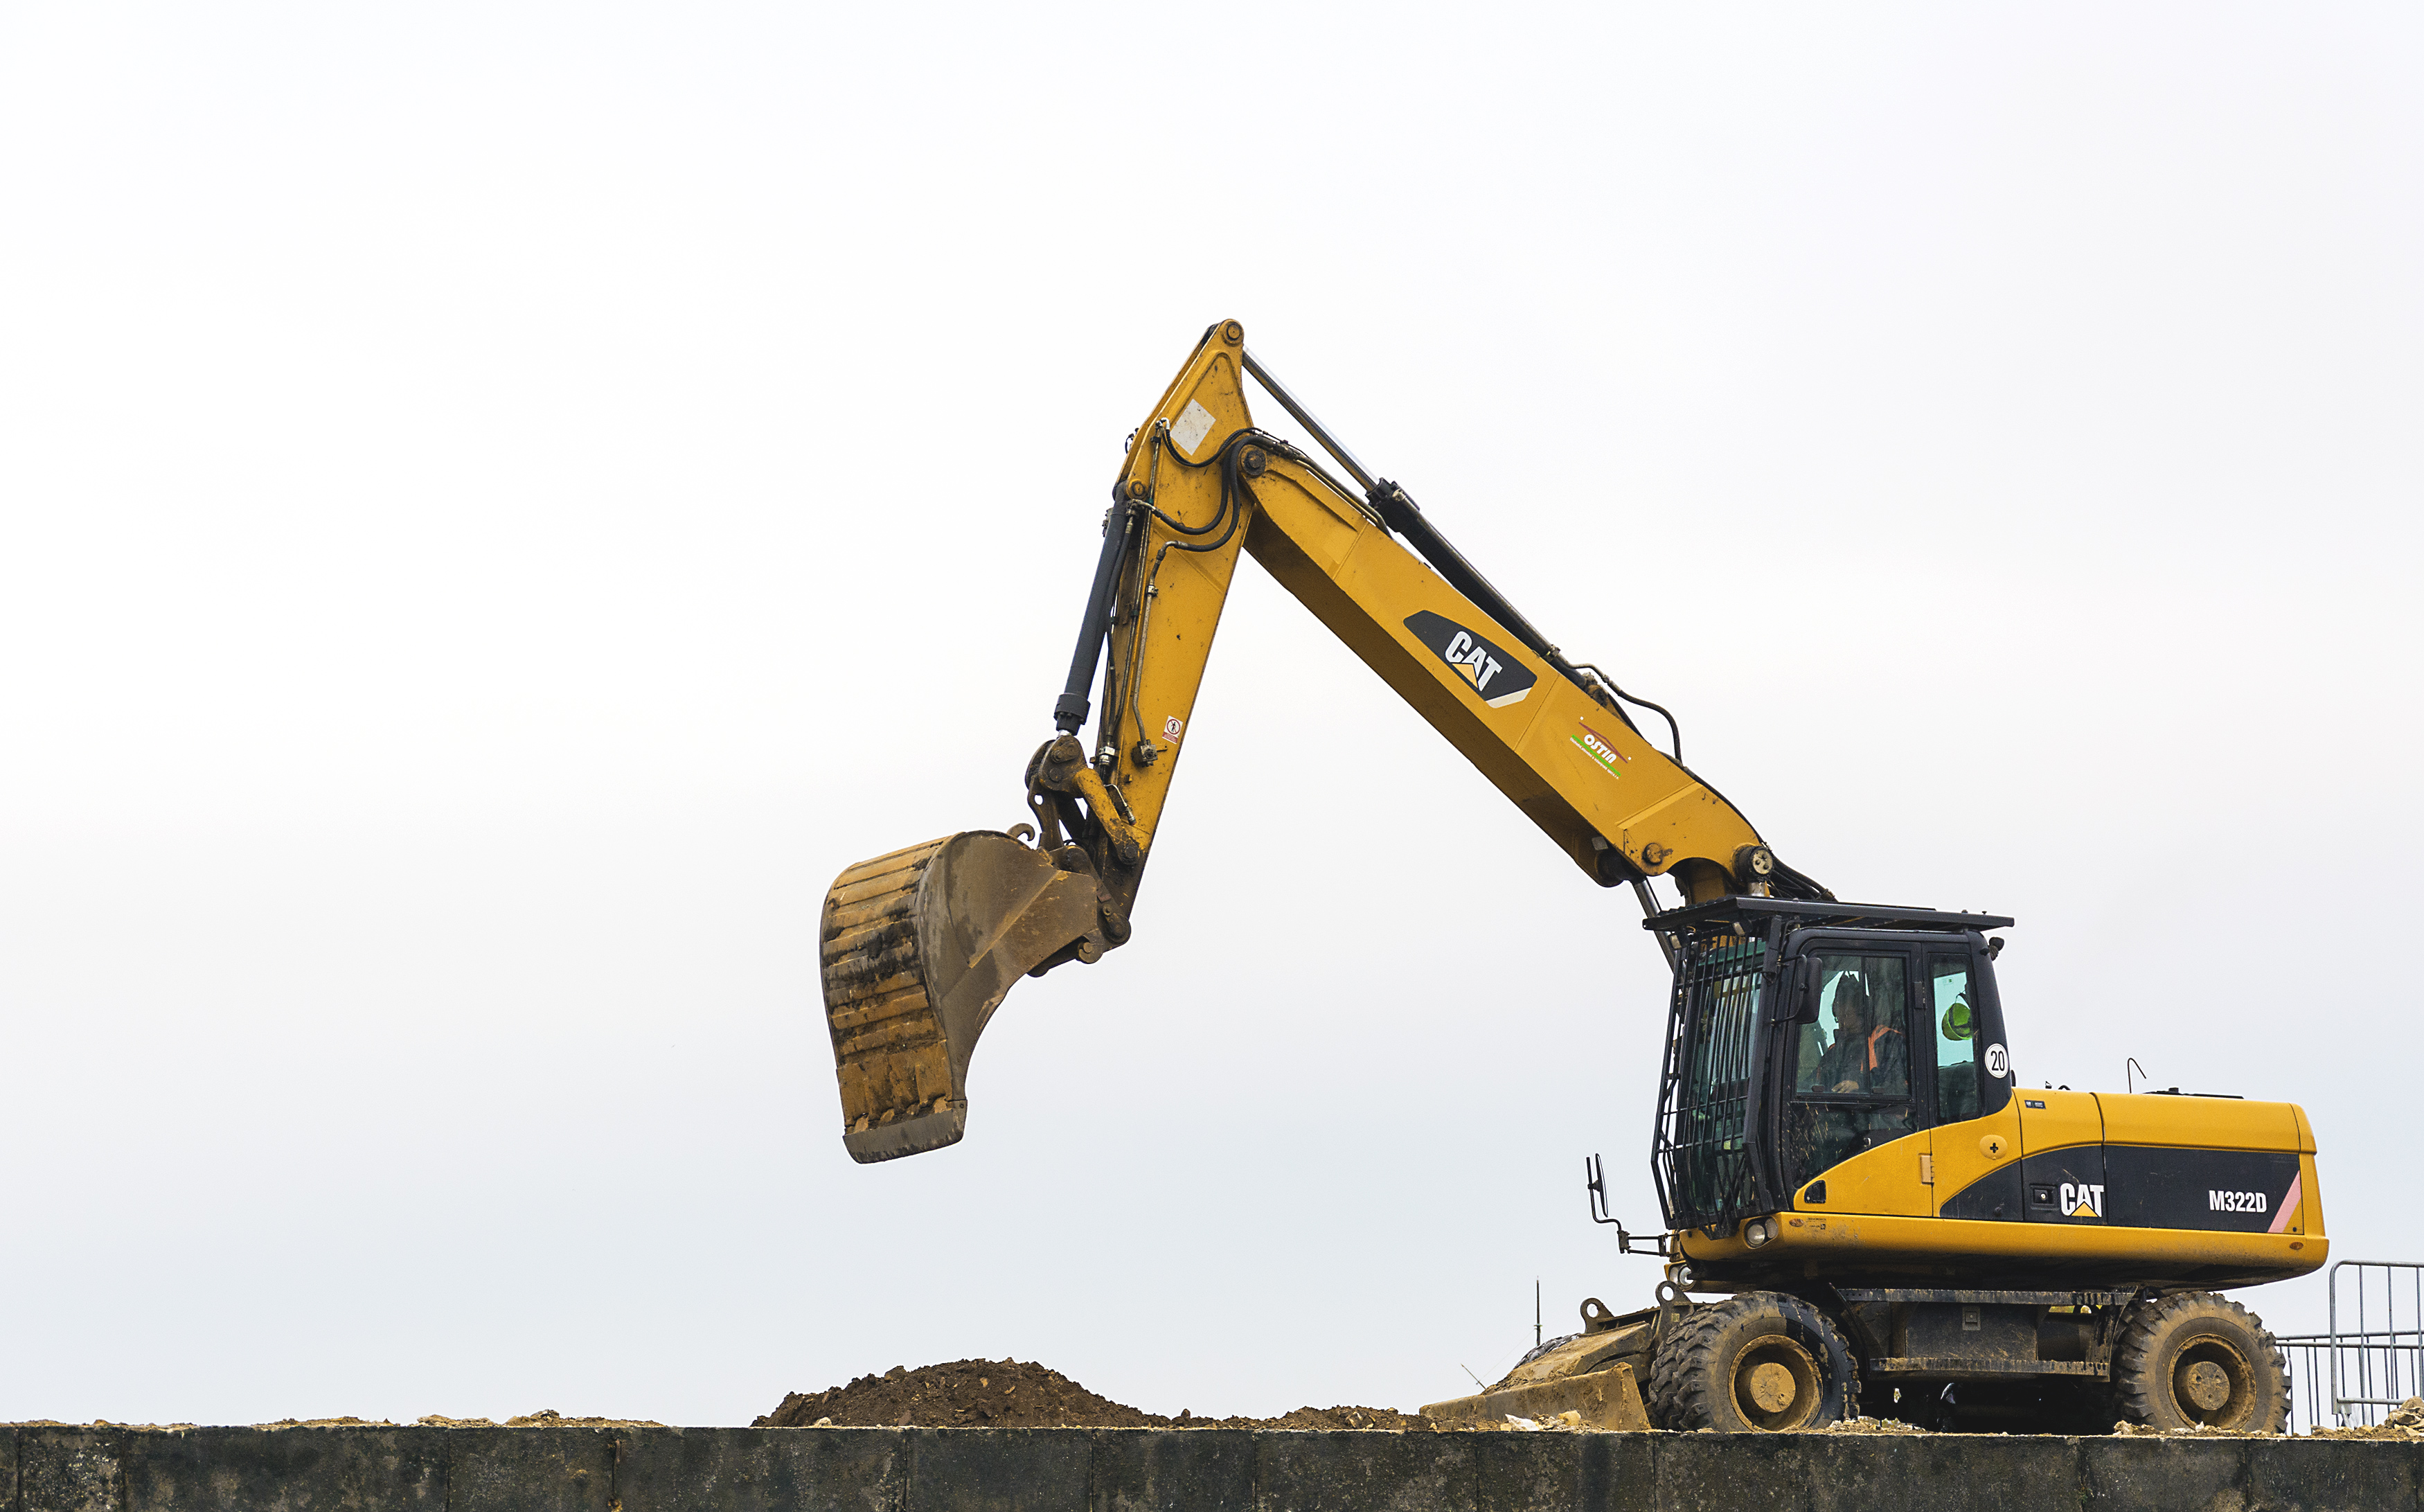 Free Image: Yellow Excavator | Libreshot Public Domain Photos